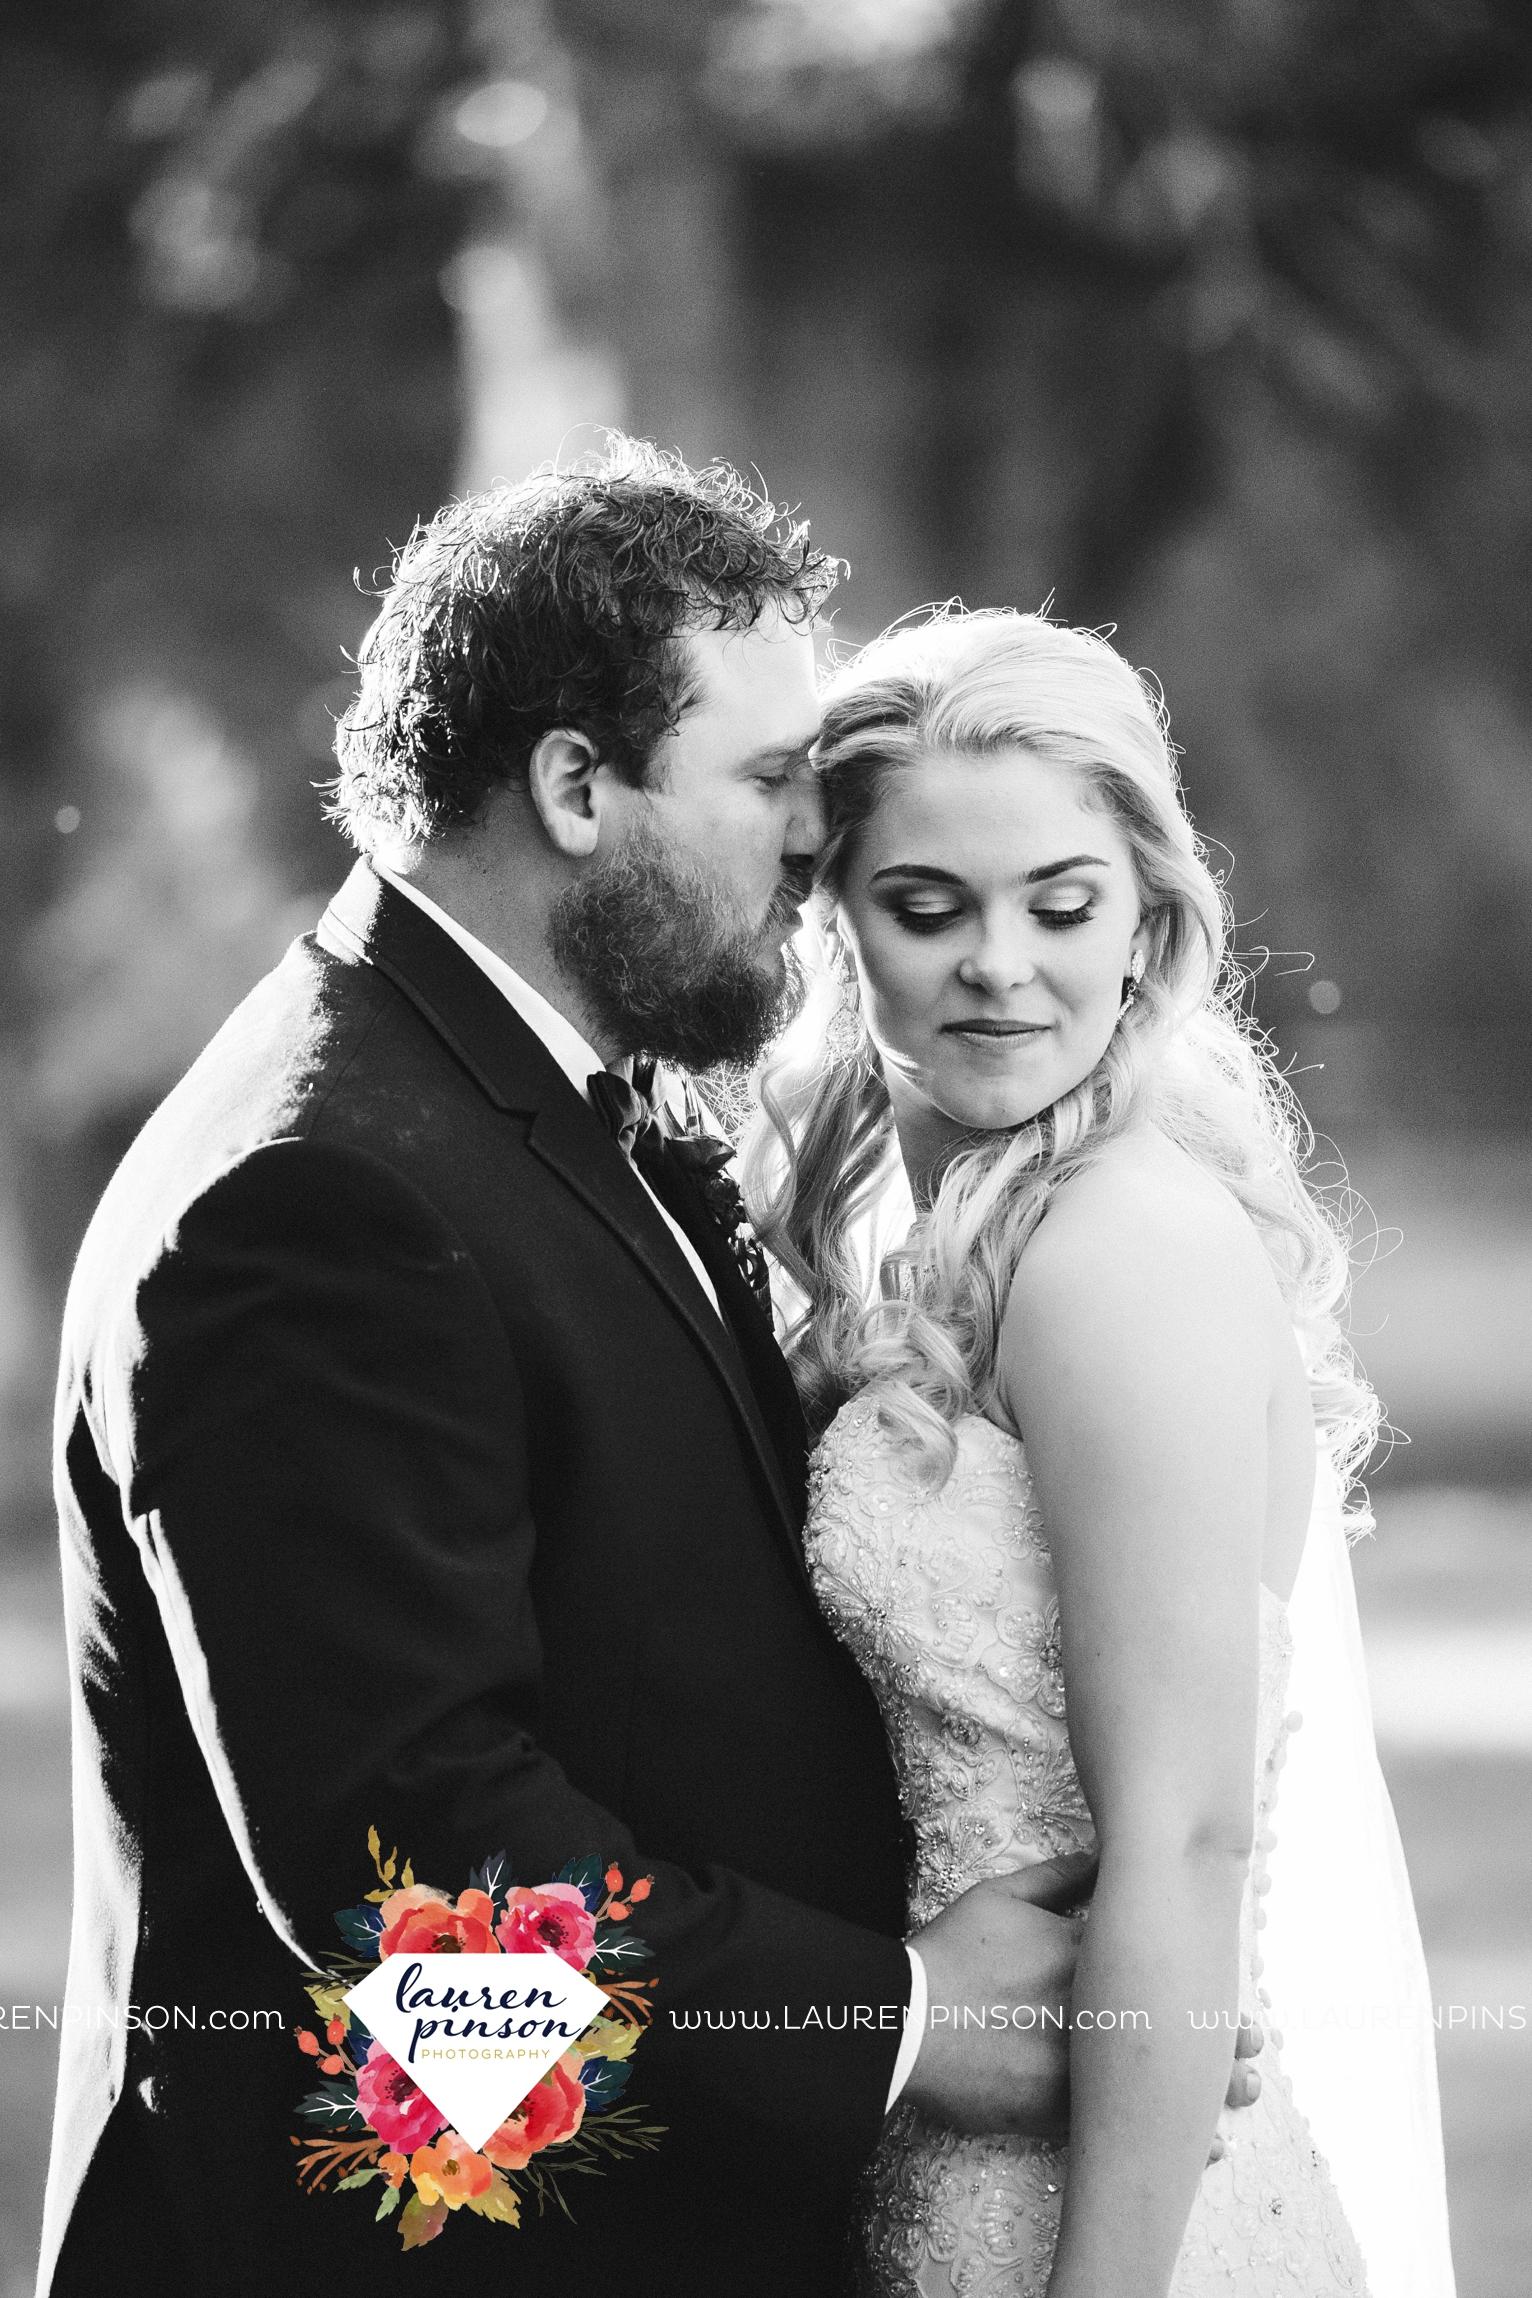 rustic-wichita-falls-texas-wedding-photographer-gold-glam-mayfield-events-market-street-united-allue-bridals-fall_1772.jpg